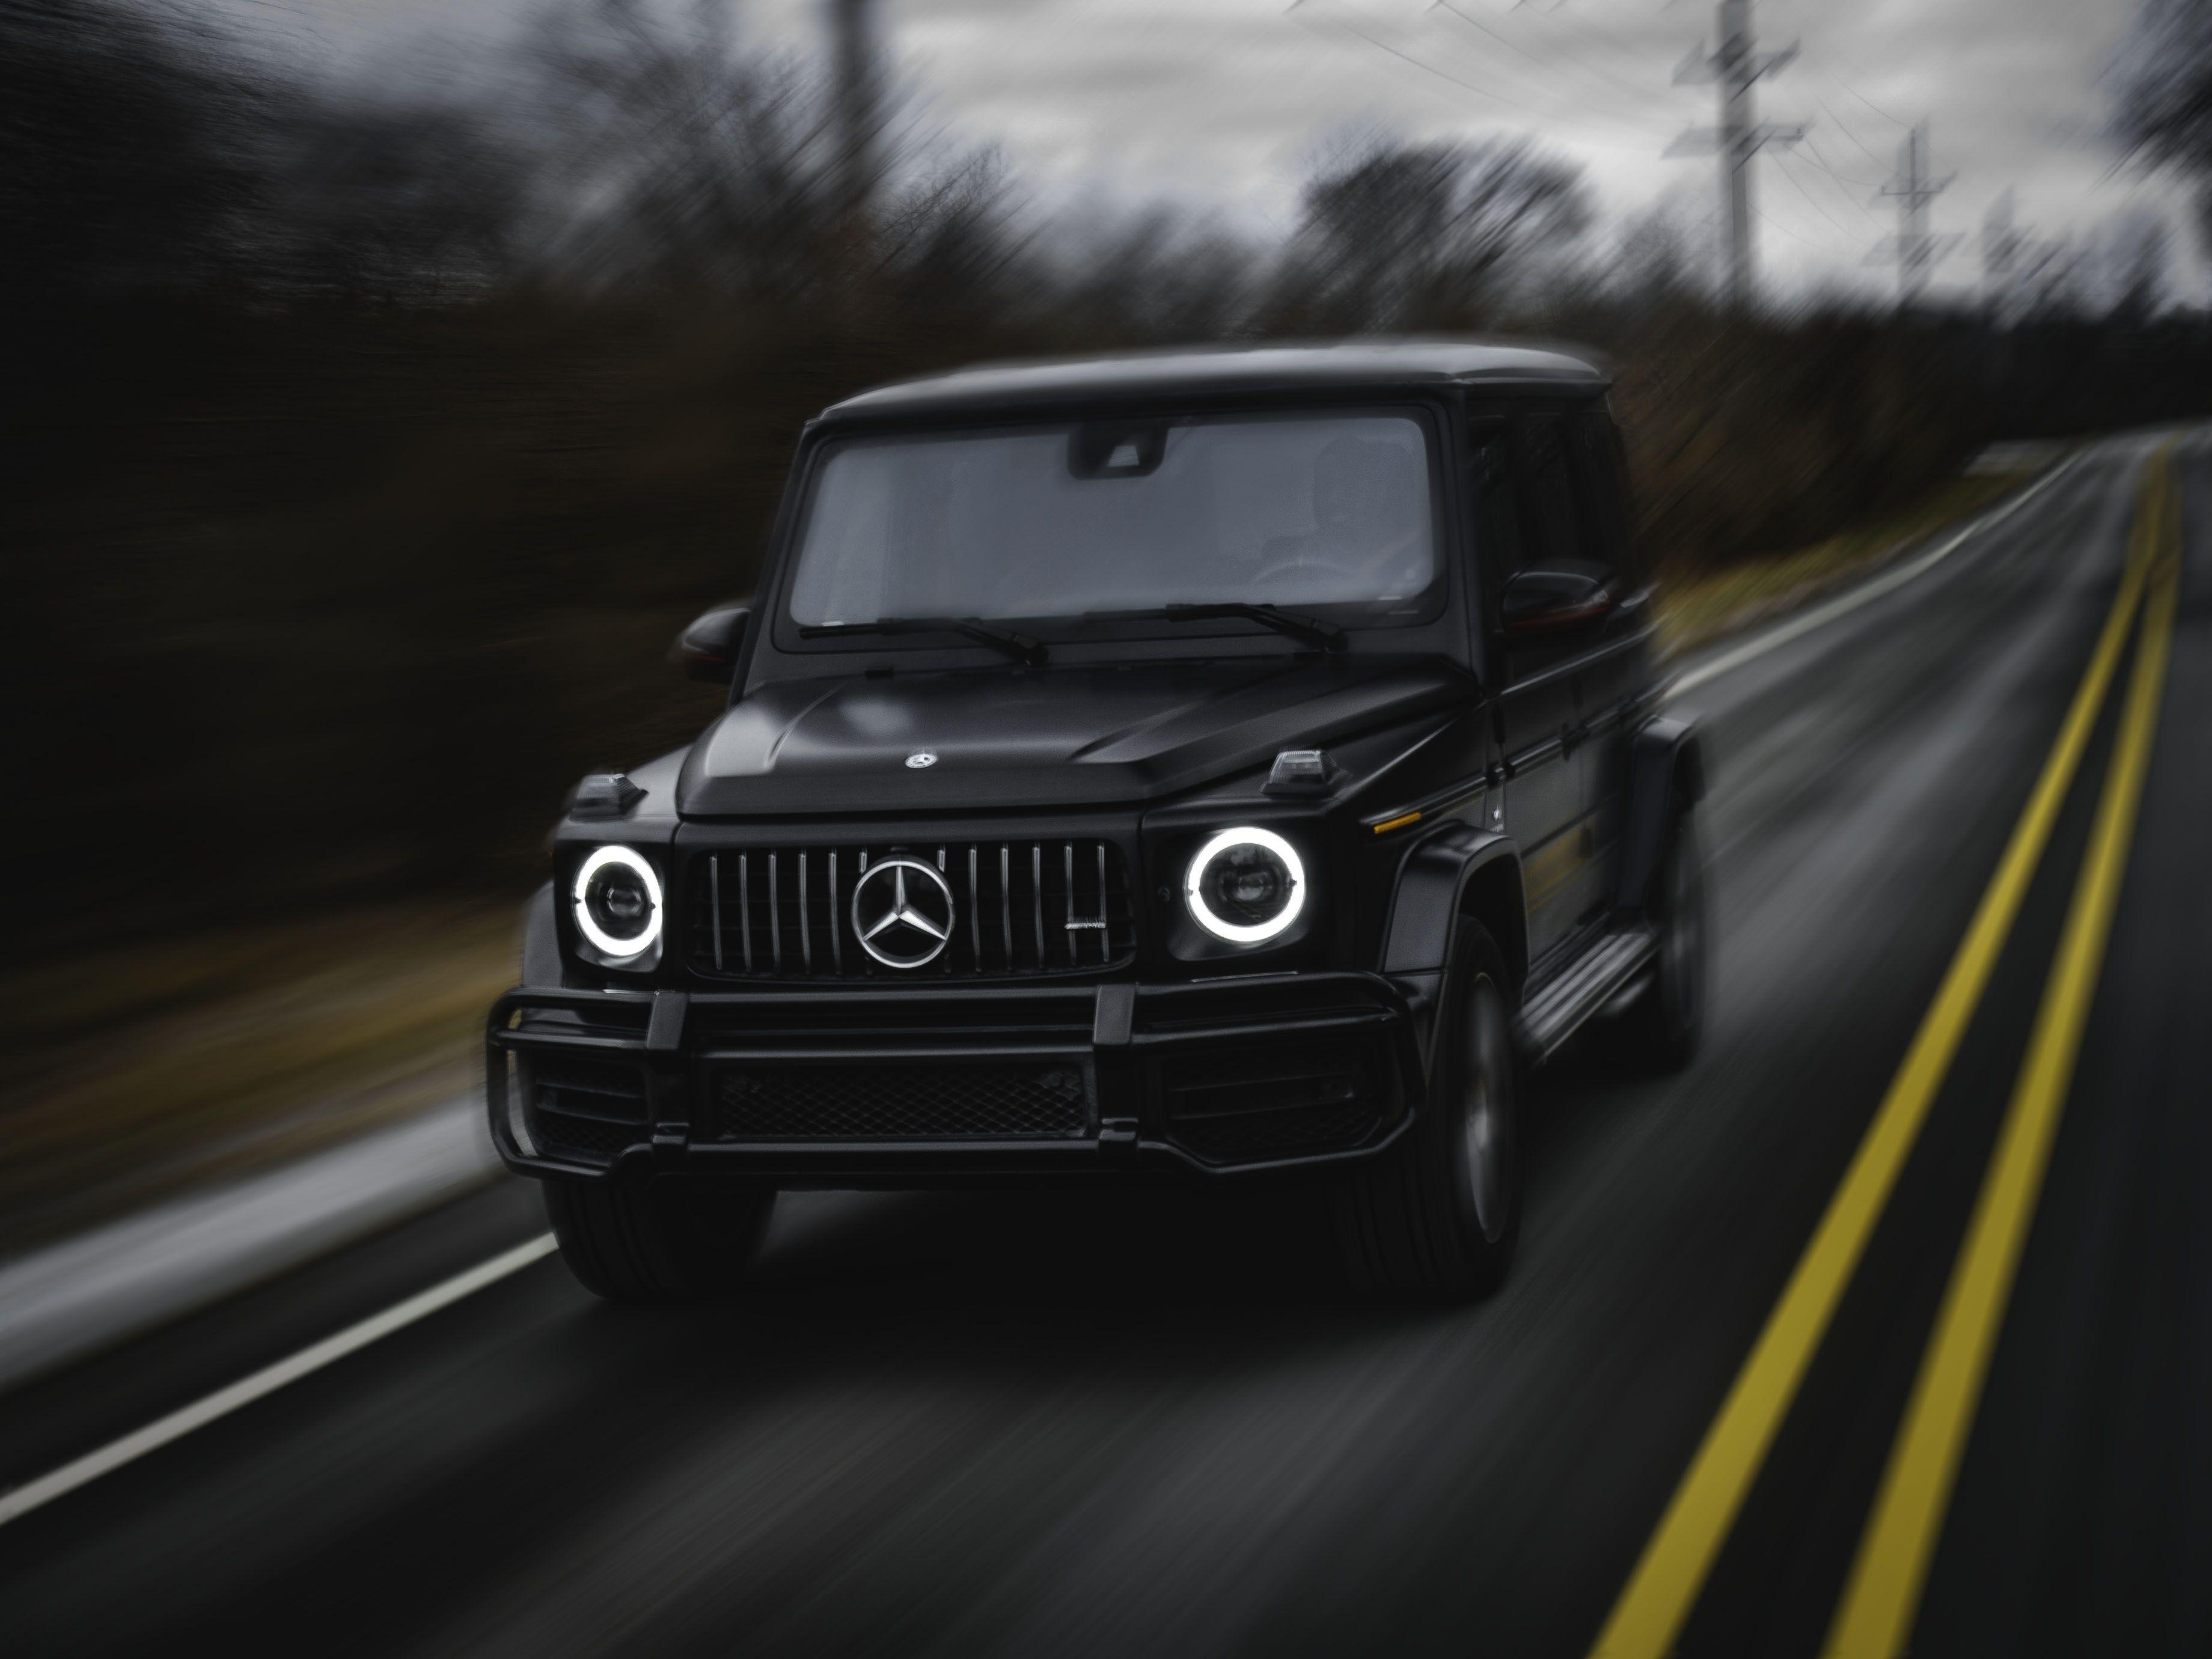 2019 Mercedes Amg G63 New G Wagen Is A Boxy Rocket